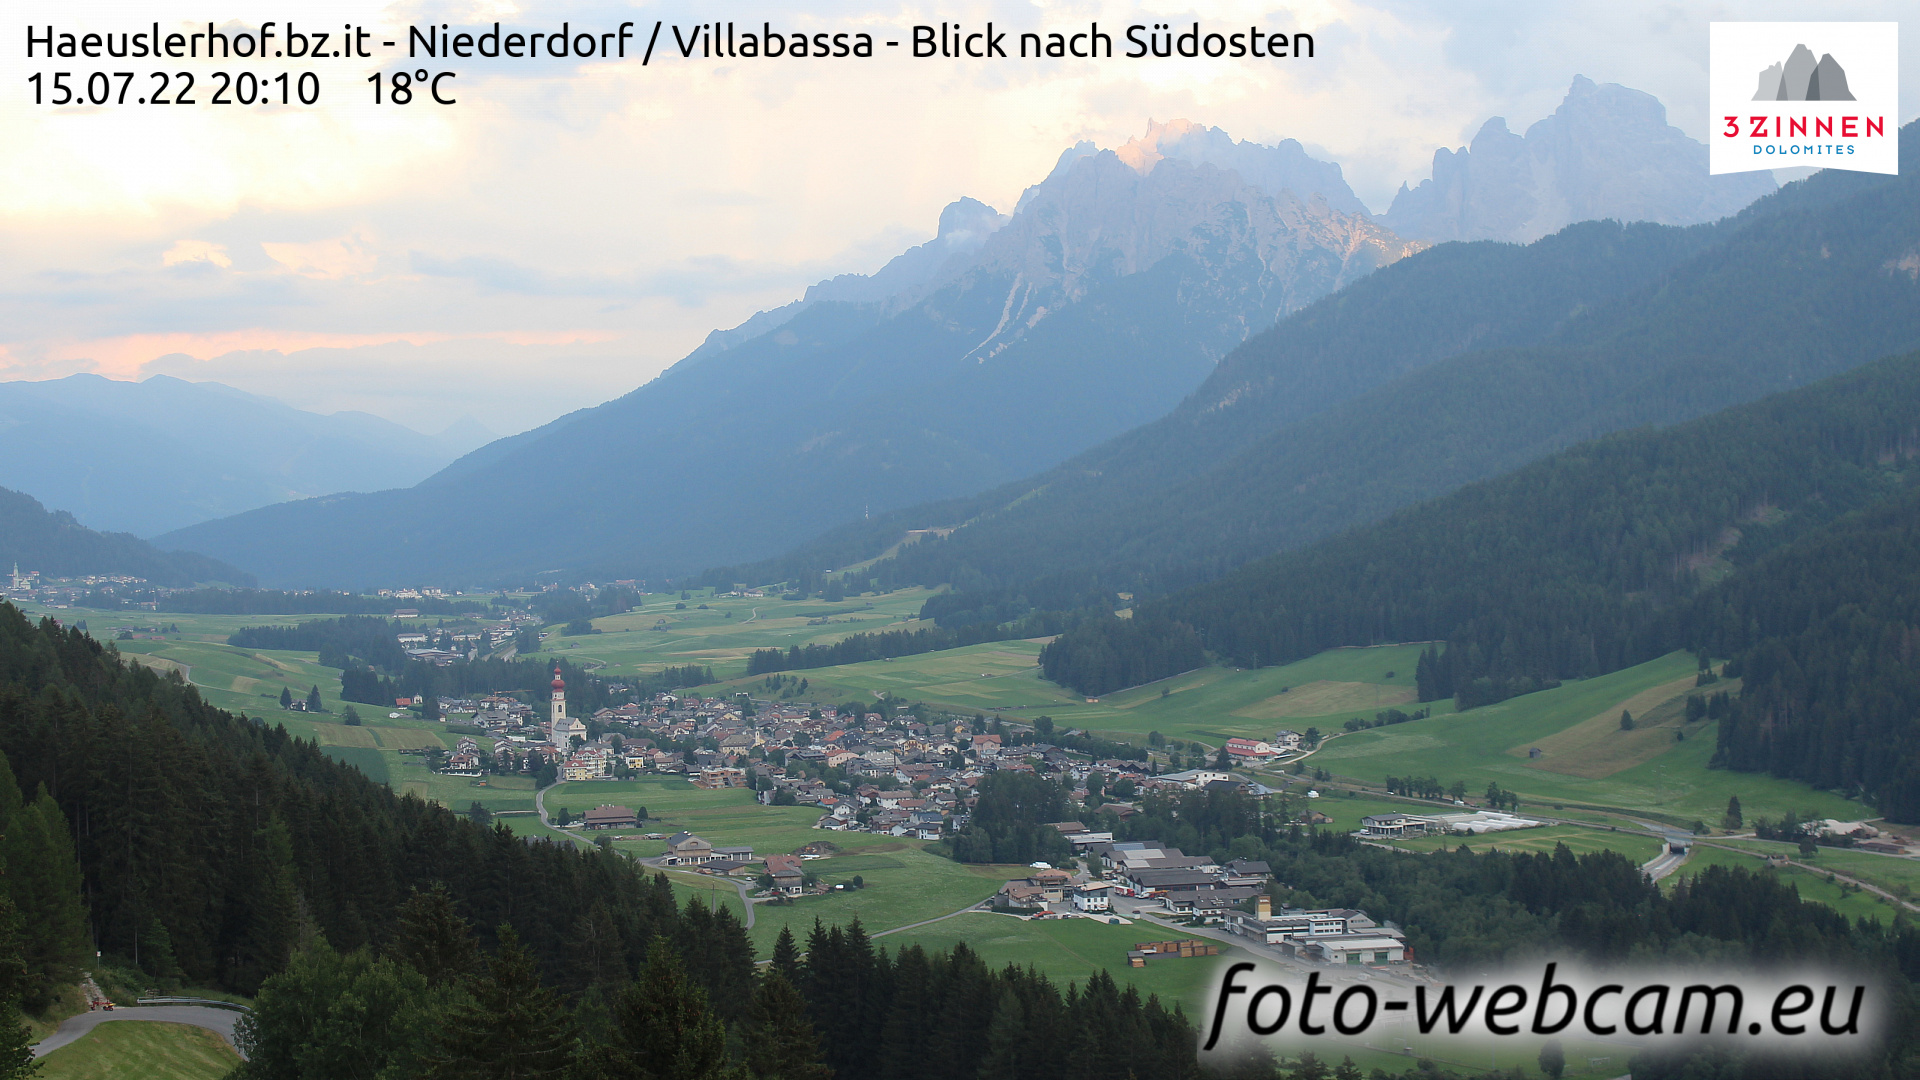 Niederdorf Wed. 20:27